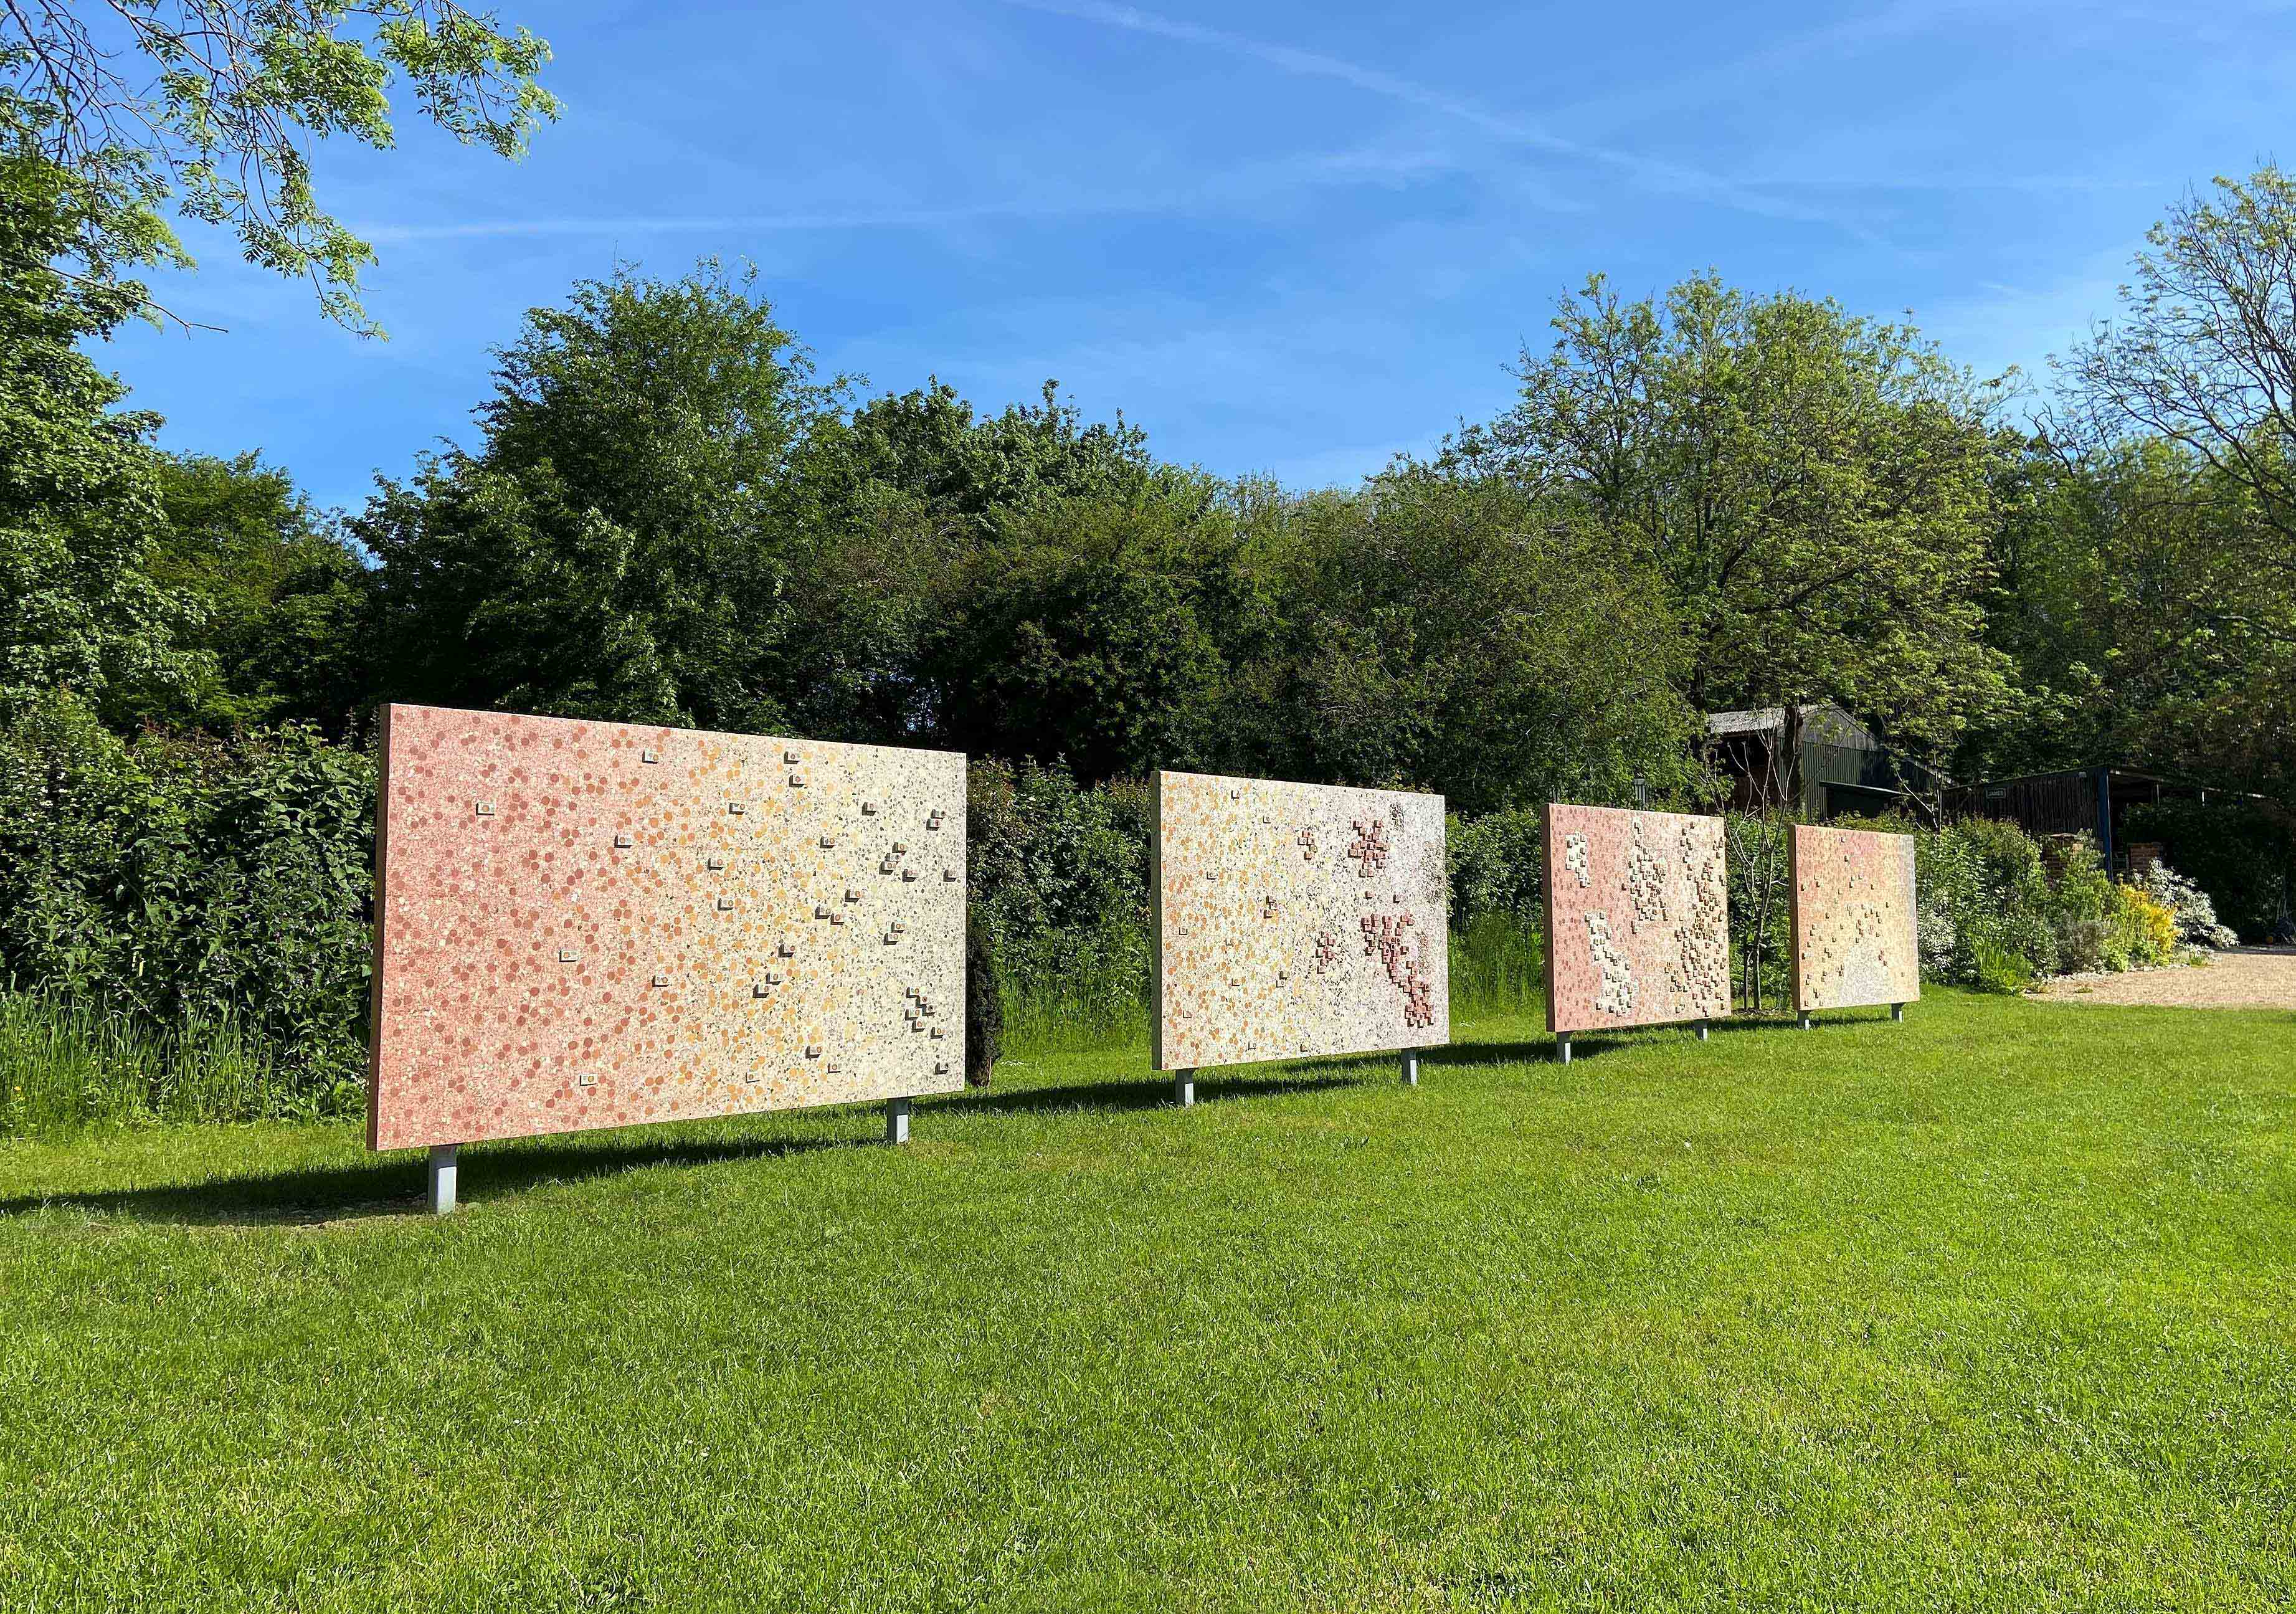 The Mutating Story exhibits at New Art Centre - Jacob Van Der Beugel